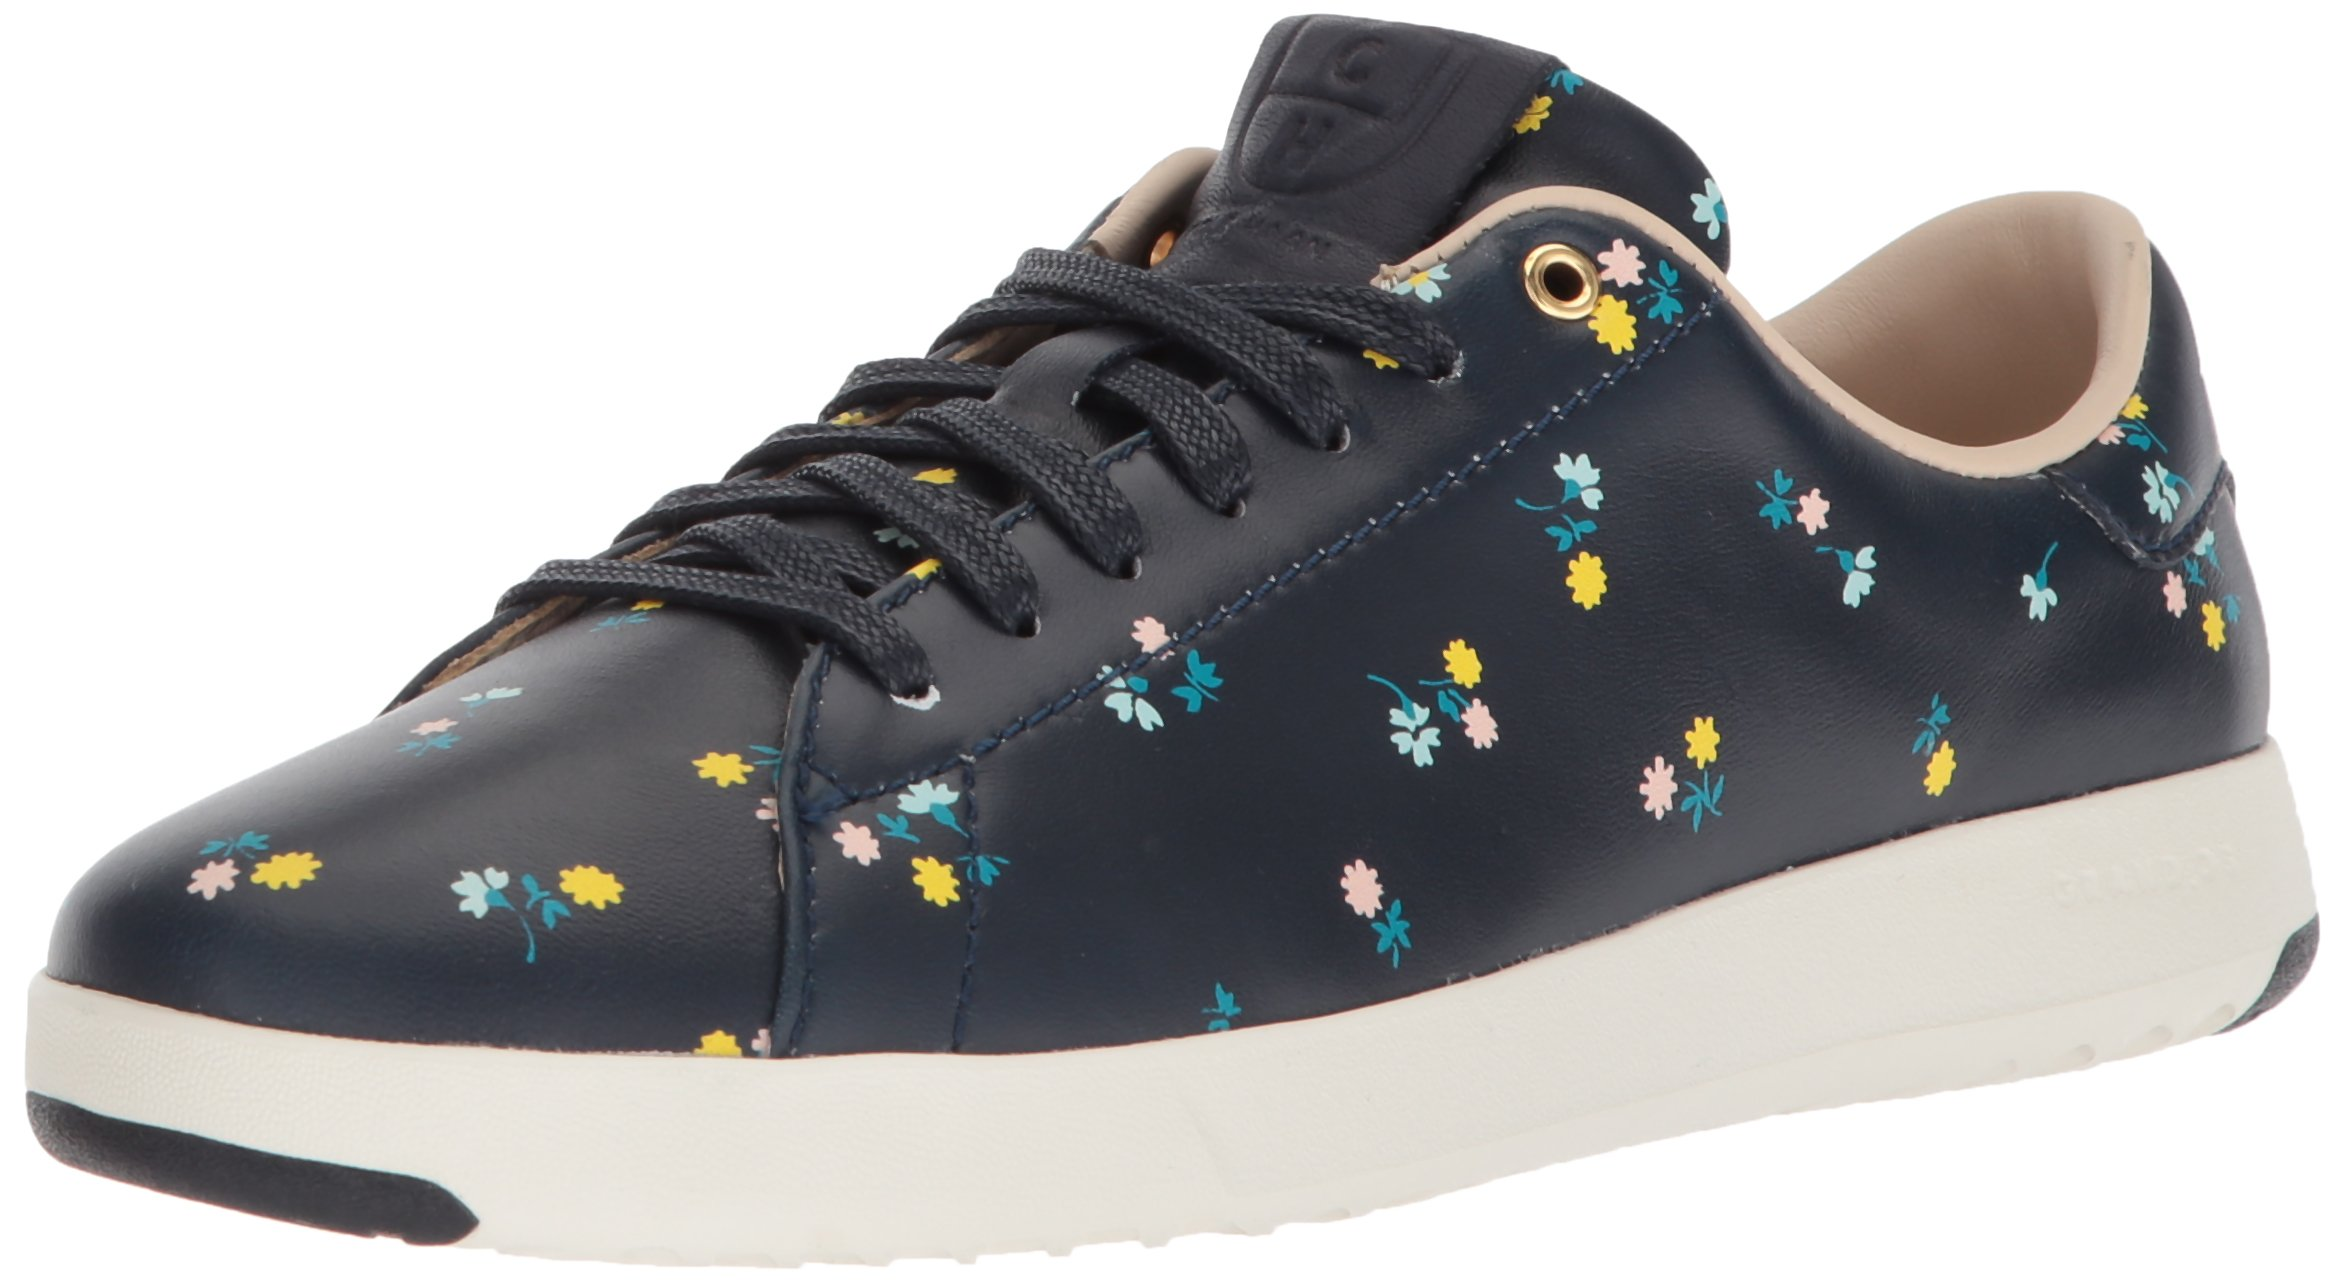 Cole Haan Women's Grandpro Tennis Sneaker, Navy Dotted Floral, 8 B US